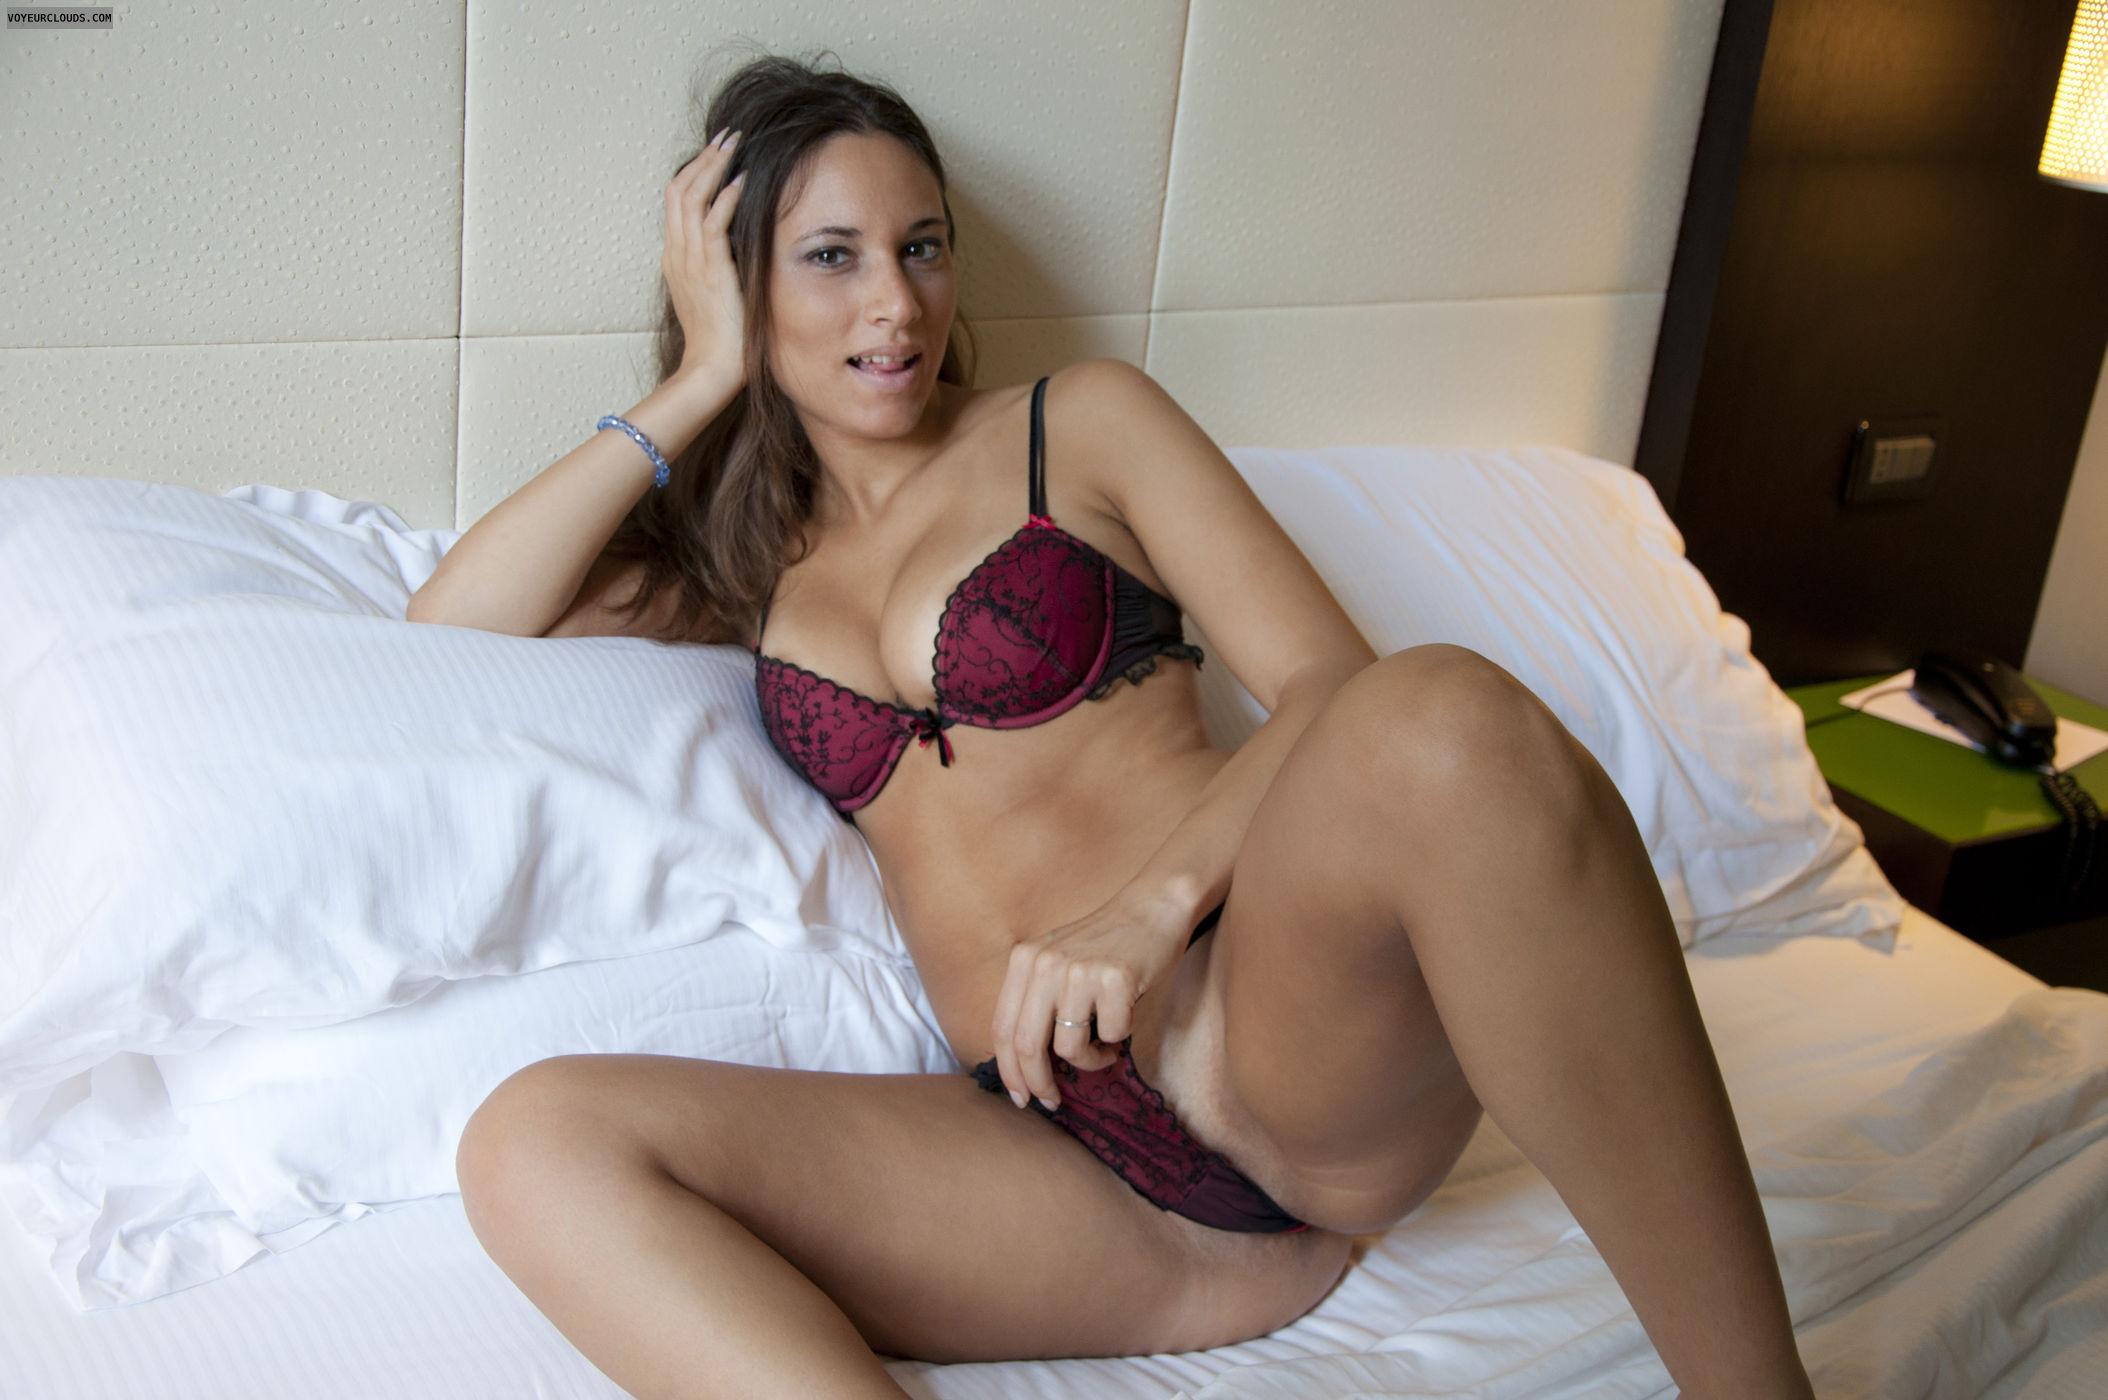 Sexy Nude Italian Girl Pics Loving Teasing  Erotic